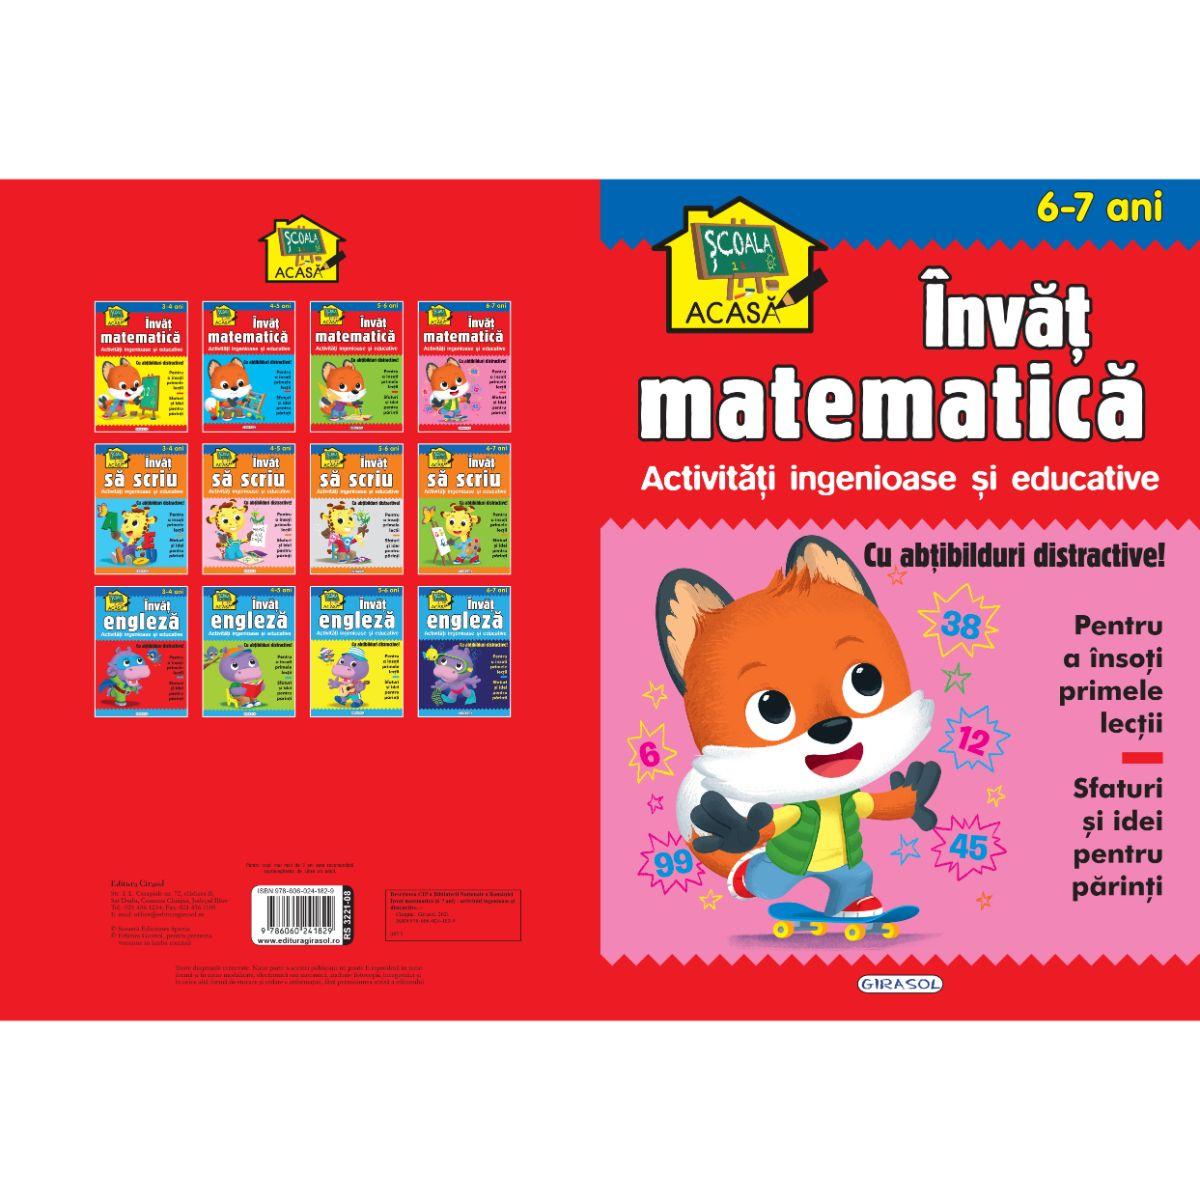 Scoala acasa, Invat matematica, 6-7 ani